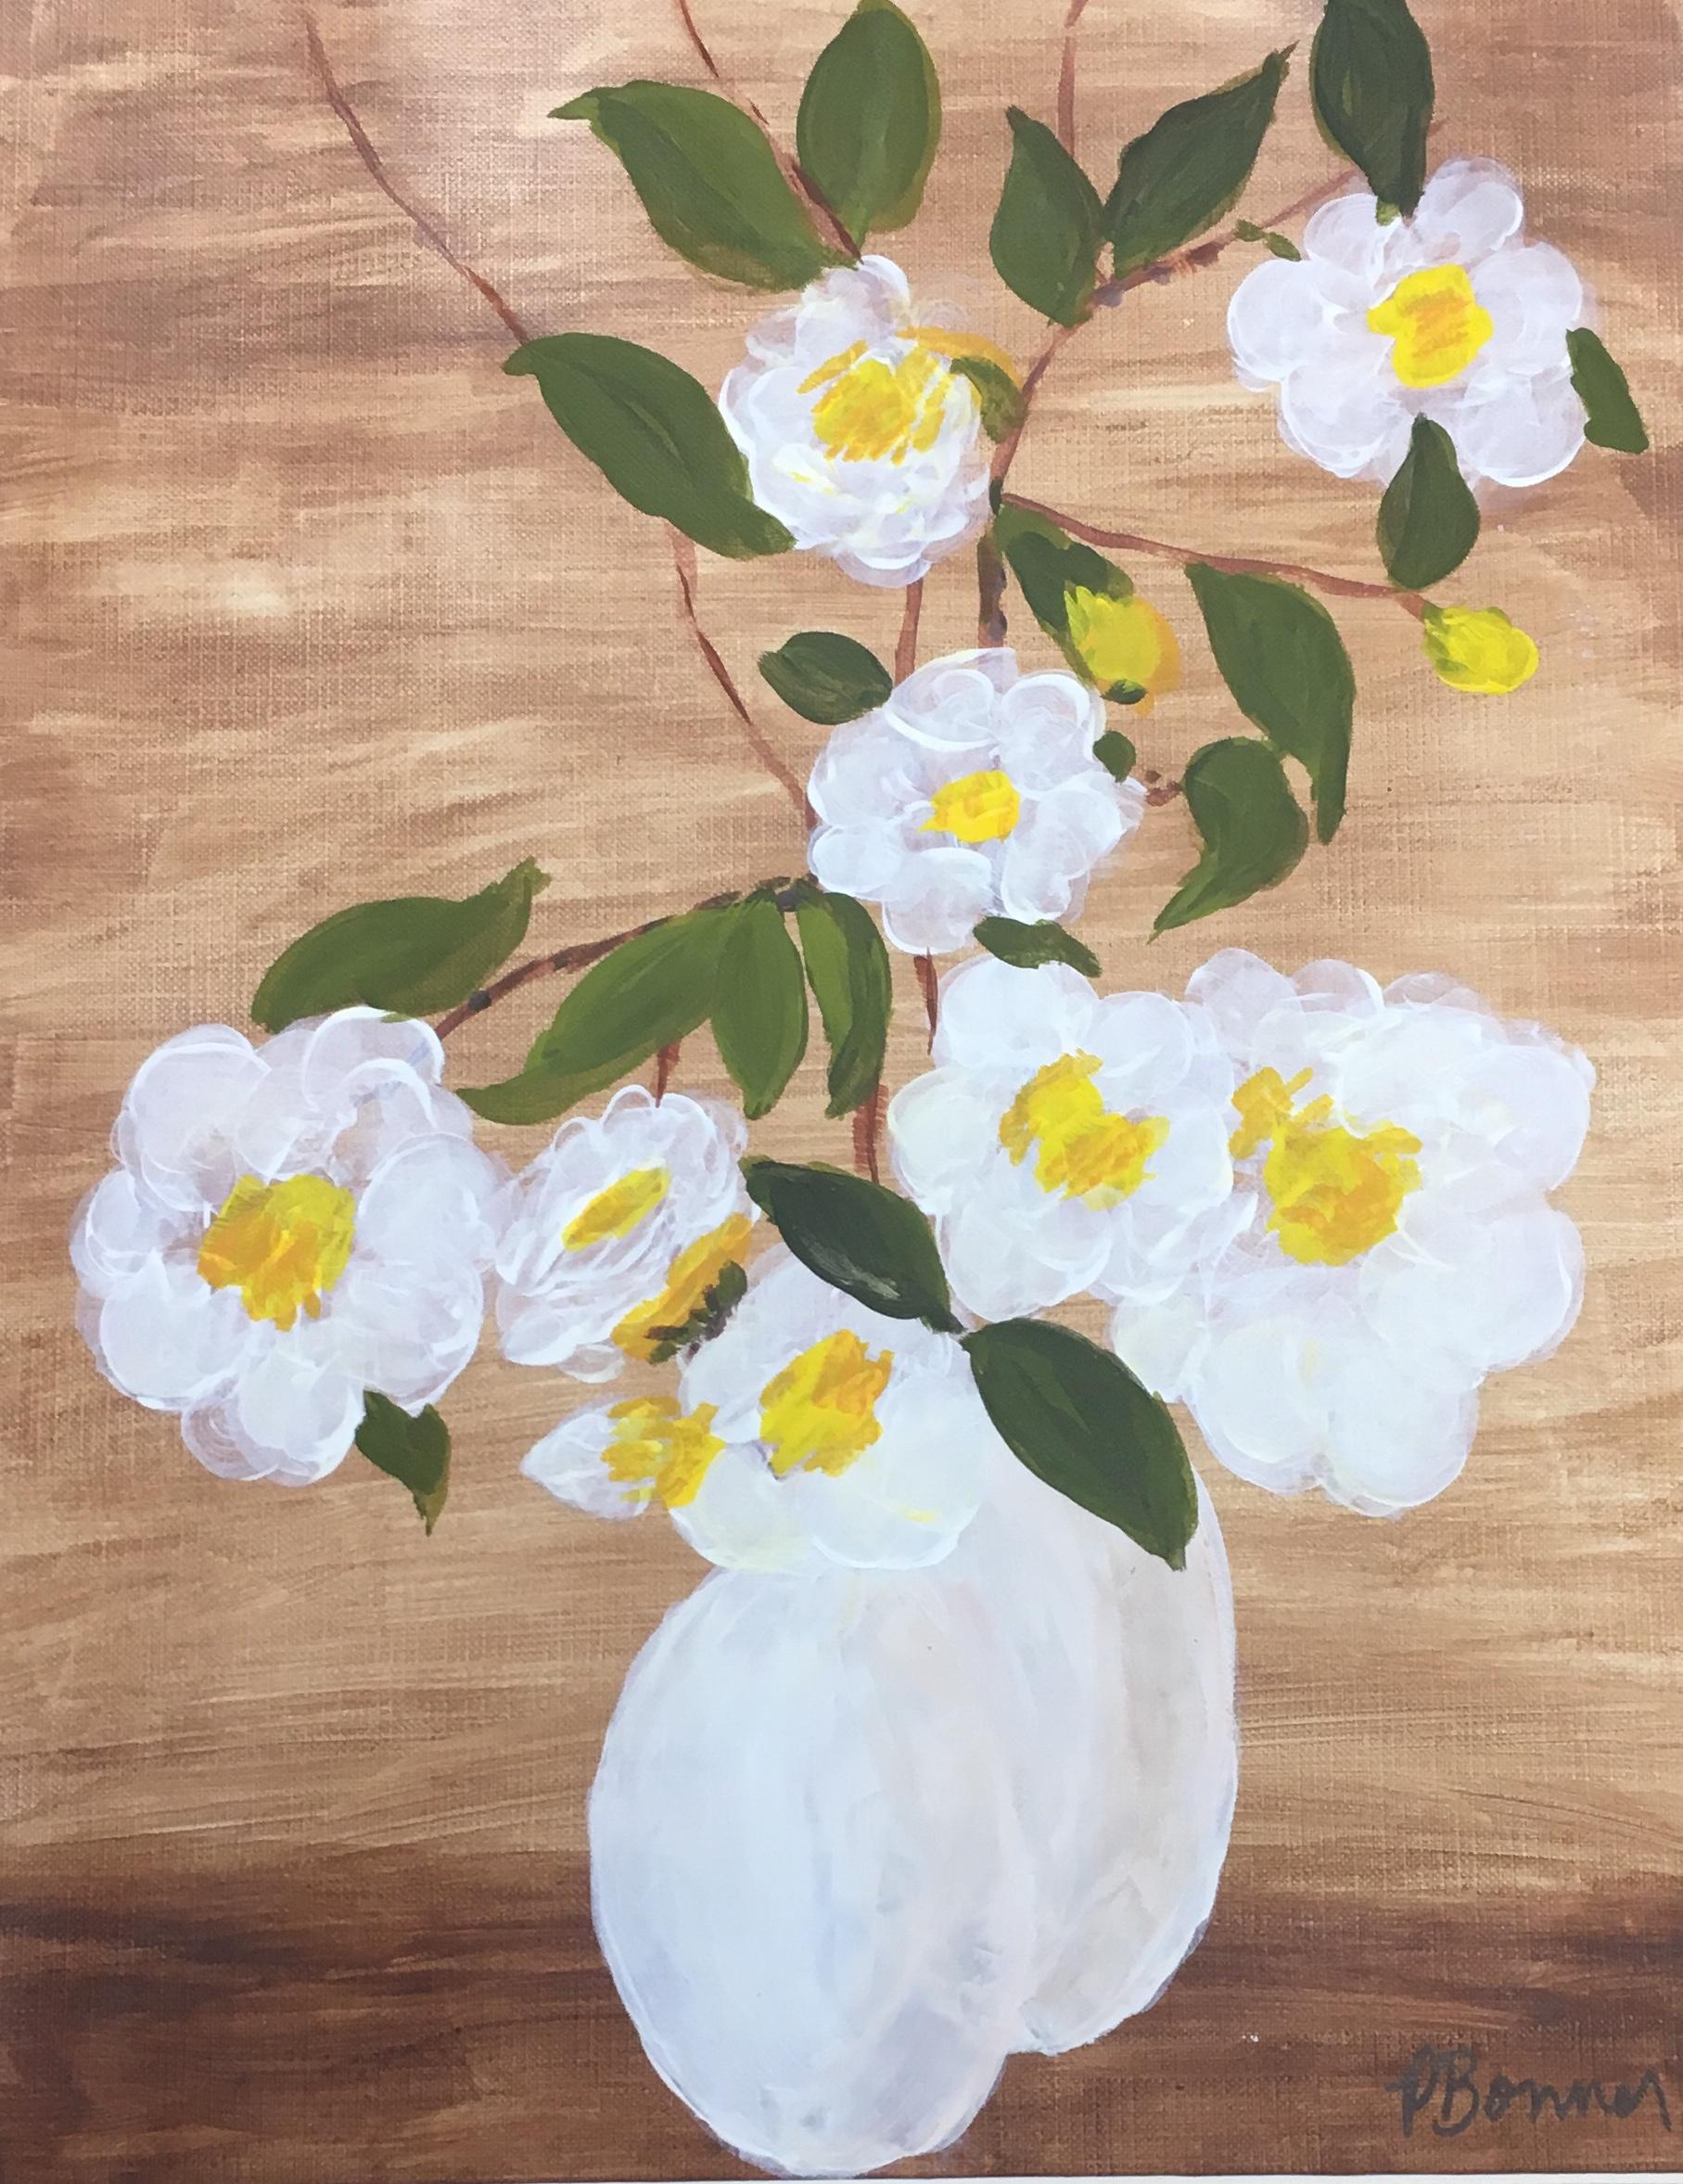 Spring Flowers, 16 x 20, acrylic, $175